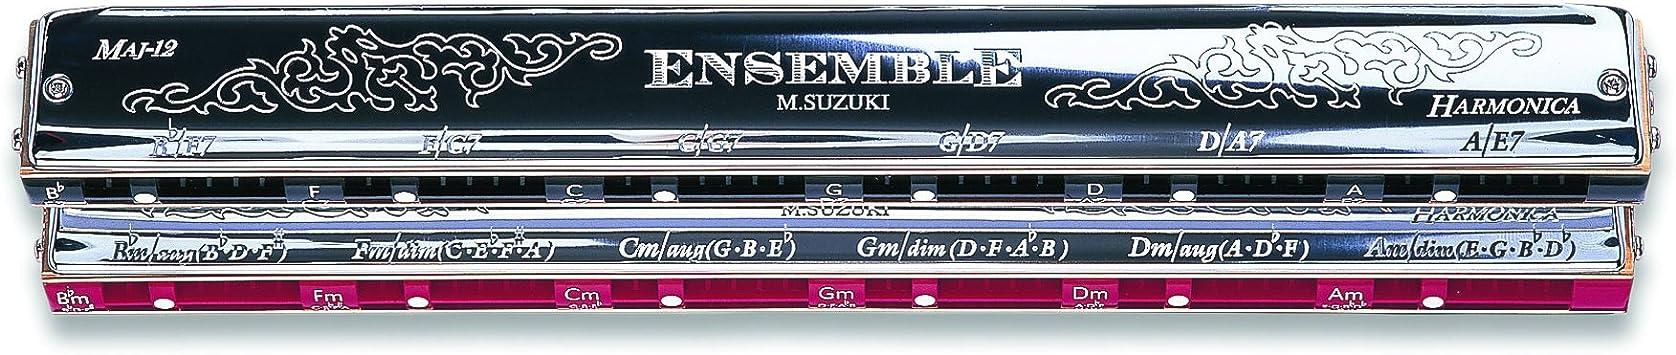 Suzuki SCH-24 Acorde Harmonika: Amazon.es: Instrumentos musicales